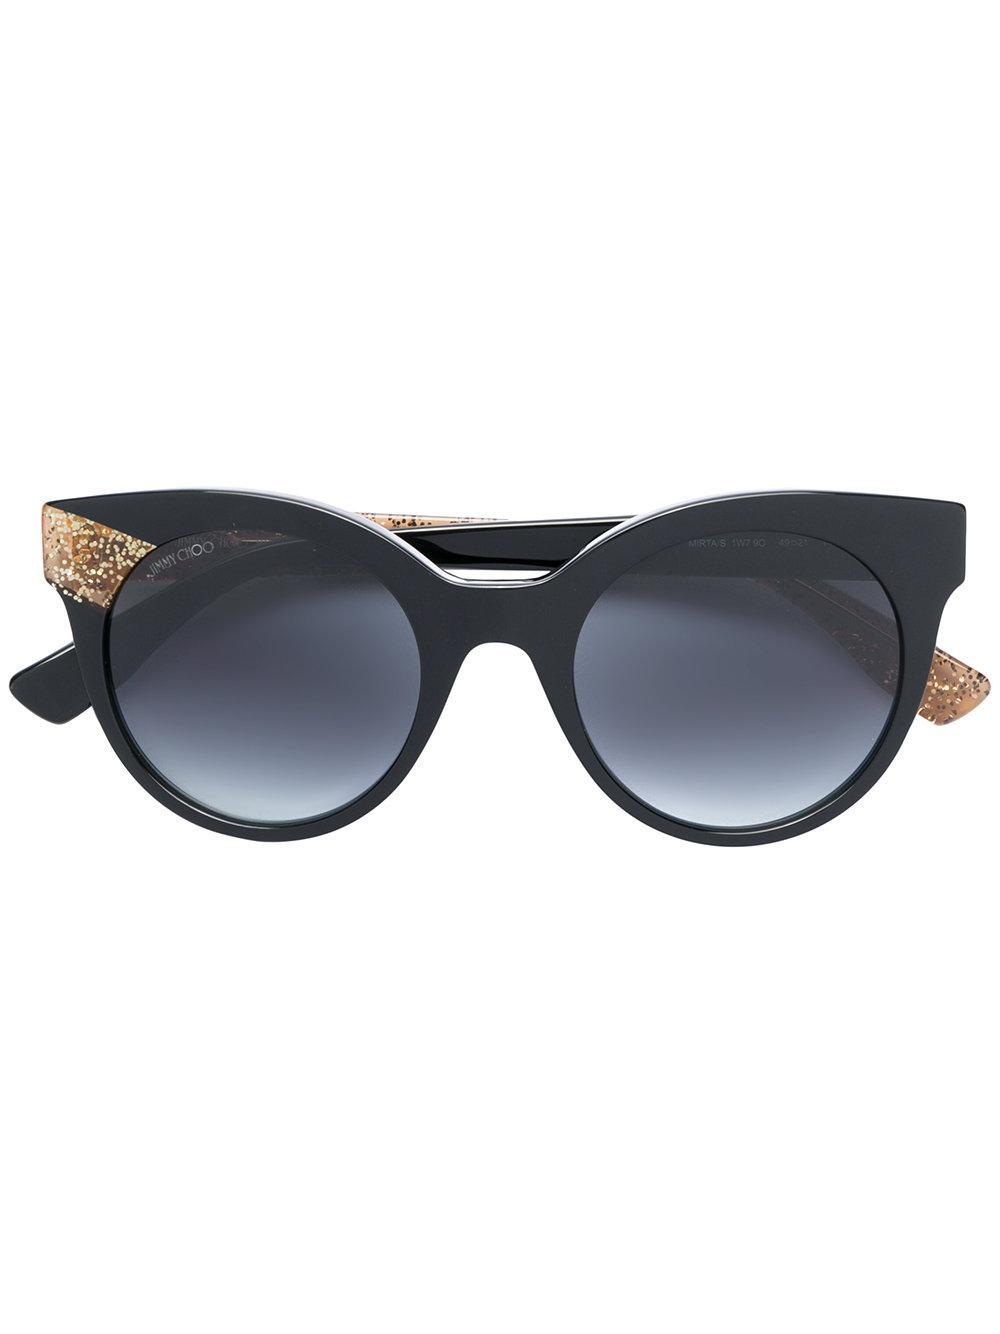 jimmy choo occhiali da sole a occhio di gatto in black lyst